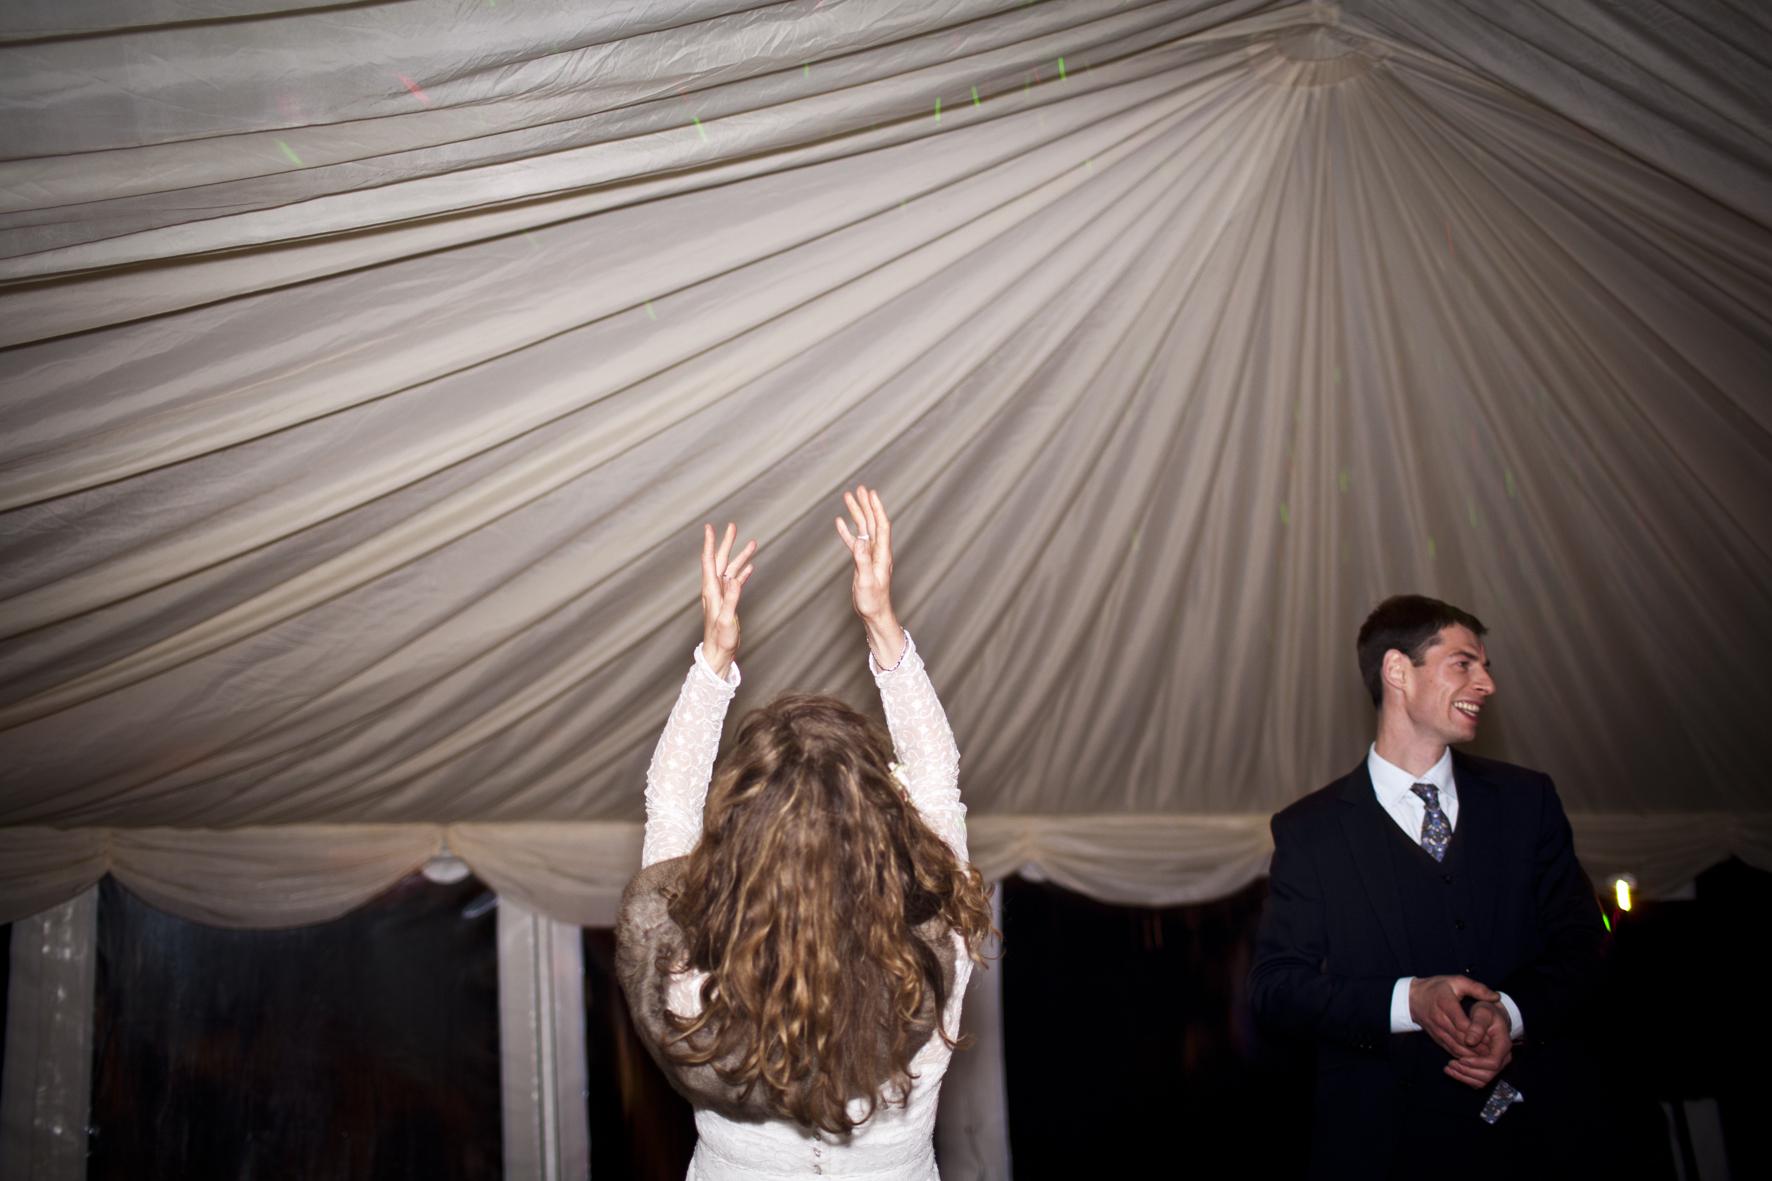 Wedding example_M&P__MG_4350_Claudia Leisinger.jpg